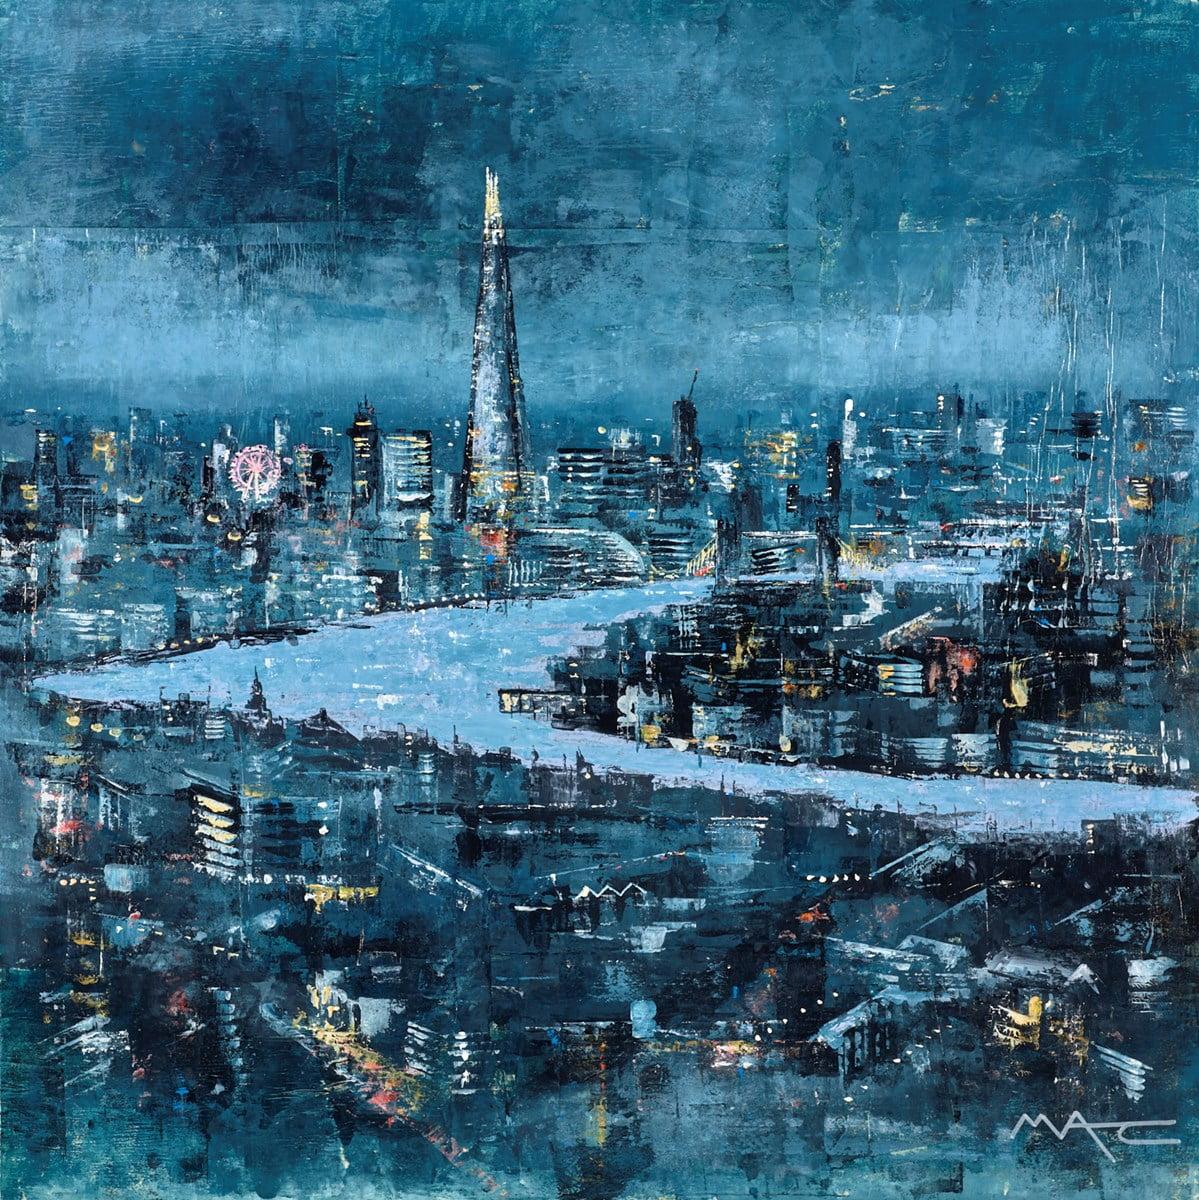 London All The Lights ~ Mark Curryer